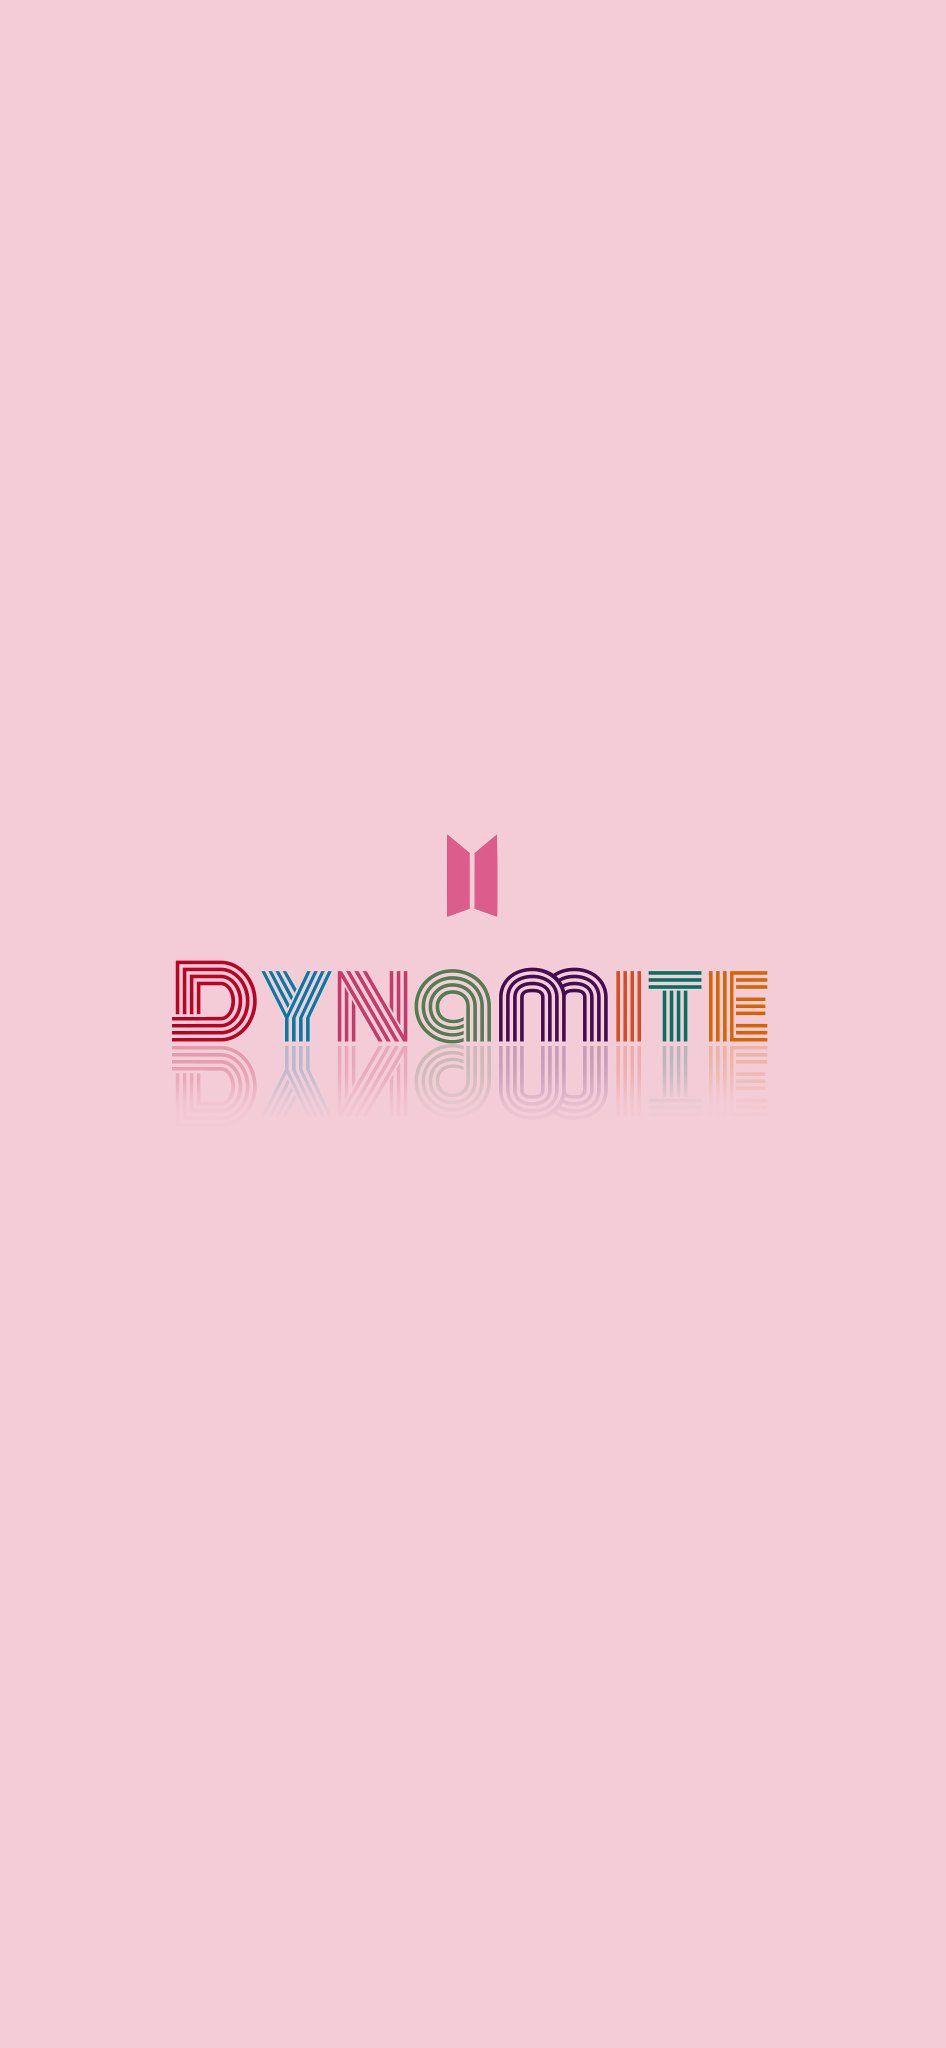 Bts Dynamite Wallpaper Lockscreen Edit Di 2020 Bts Wallpaper Ponsel Latar Belakang